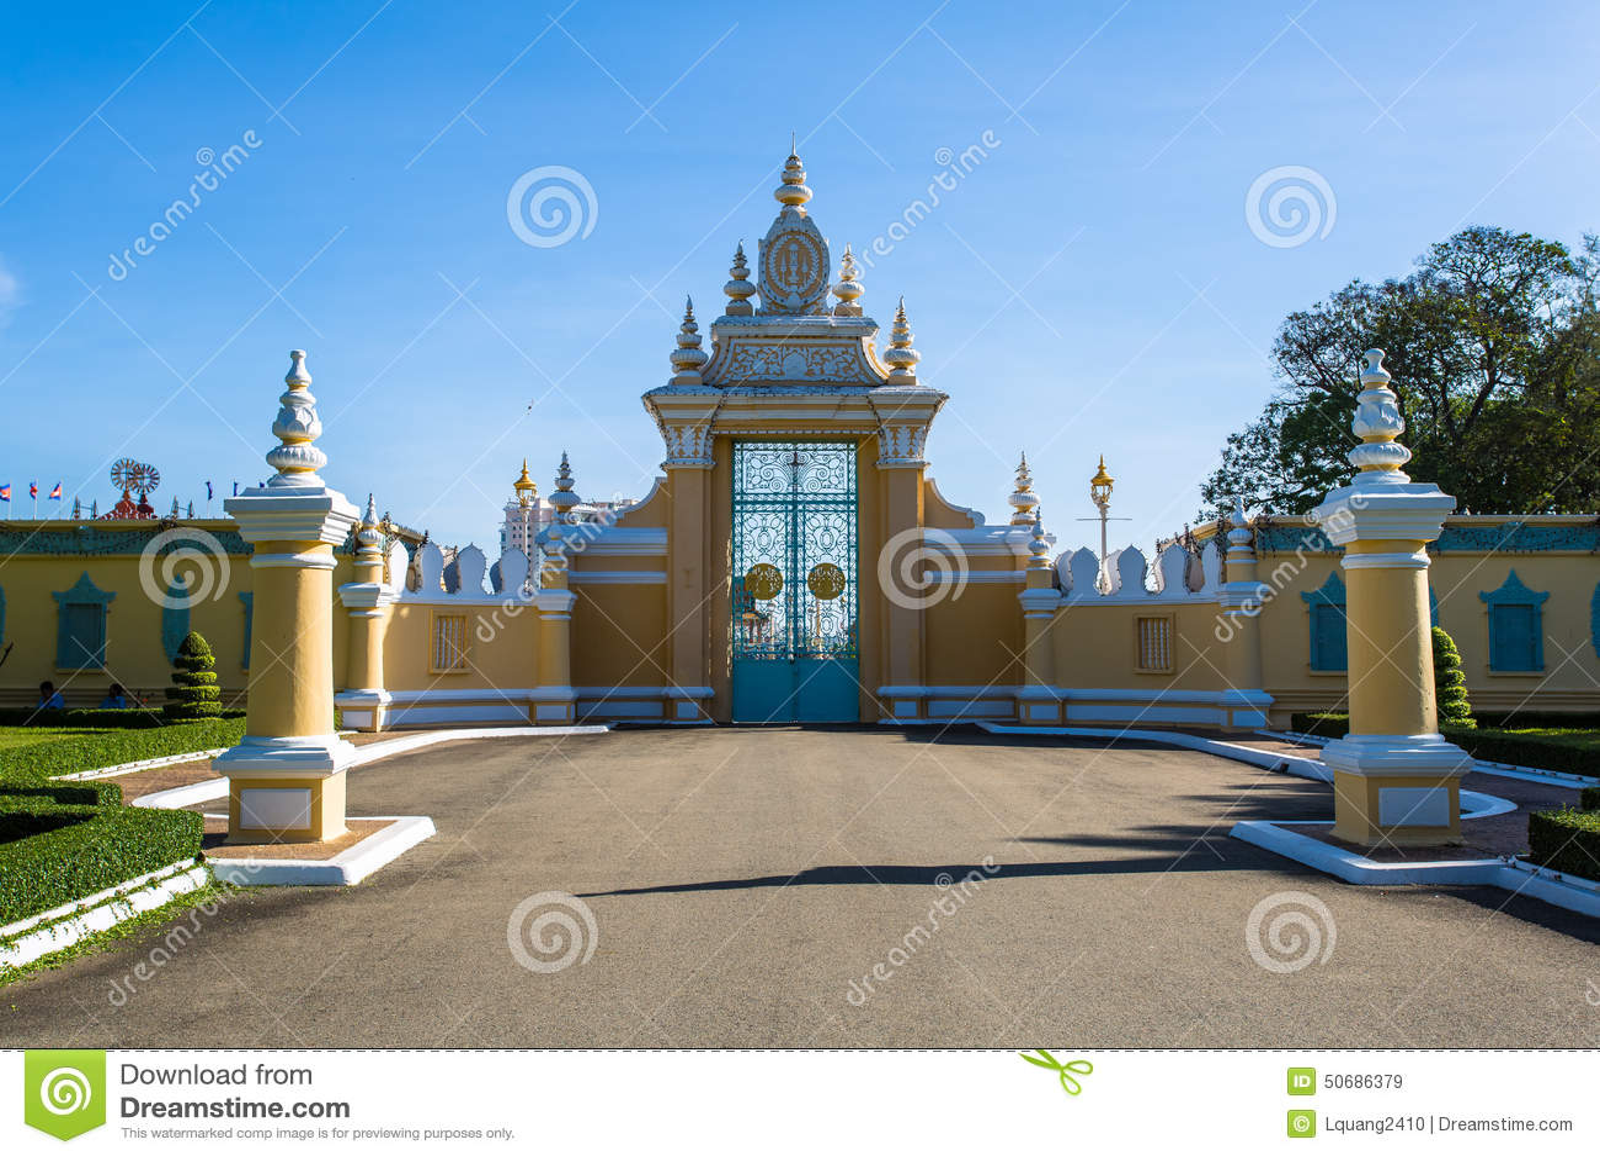 Download 皇家地方在金边 库存图片. 图片 包括有 艺术, 遗产, 金子, 城市, 镇痛药, 布琼布拉, 全部, 蓝色 - 50686379